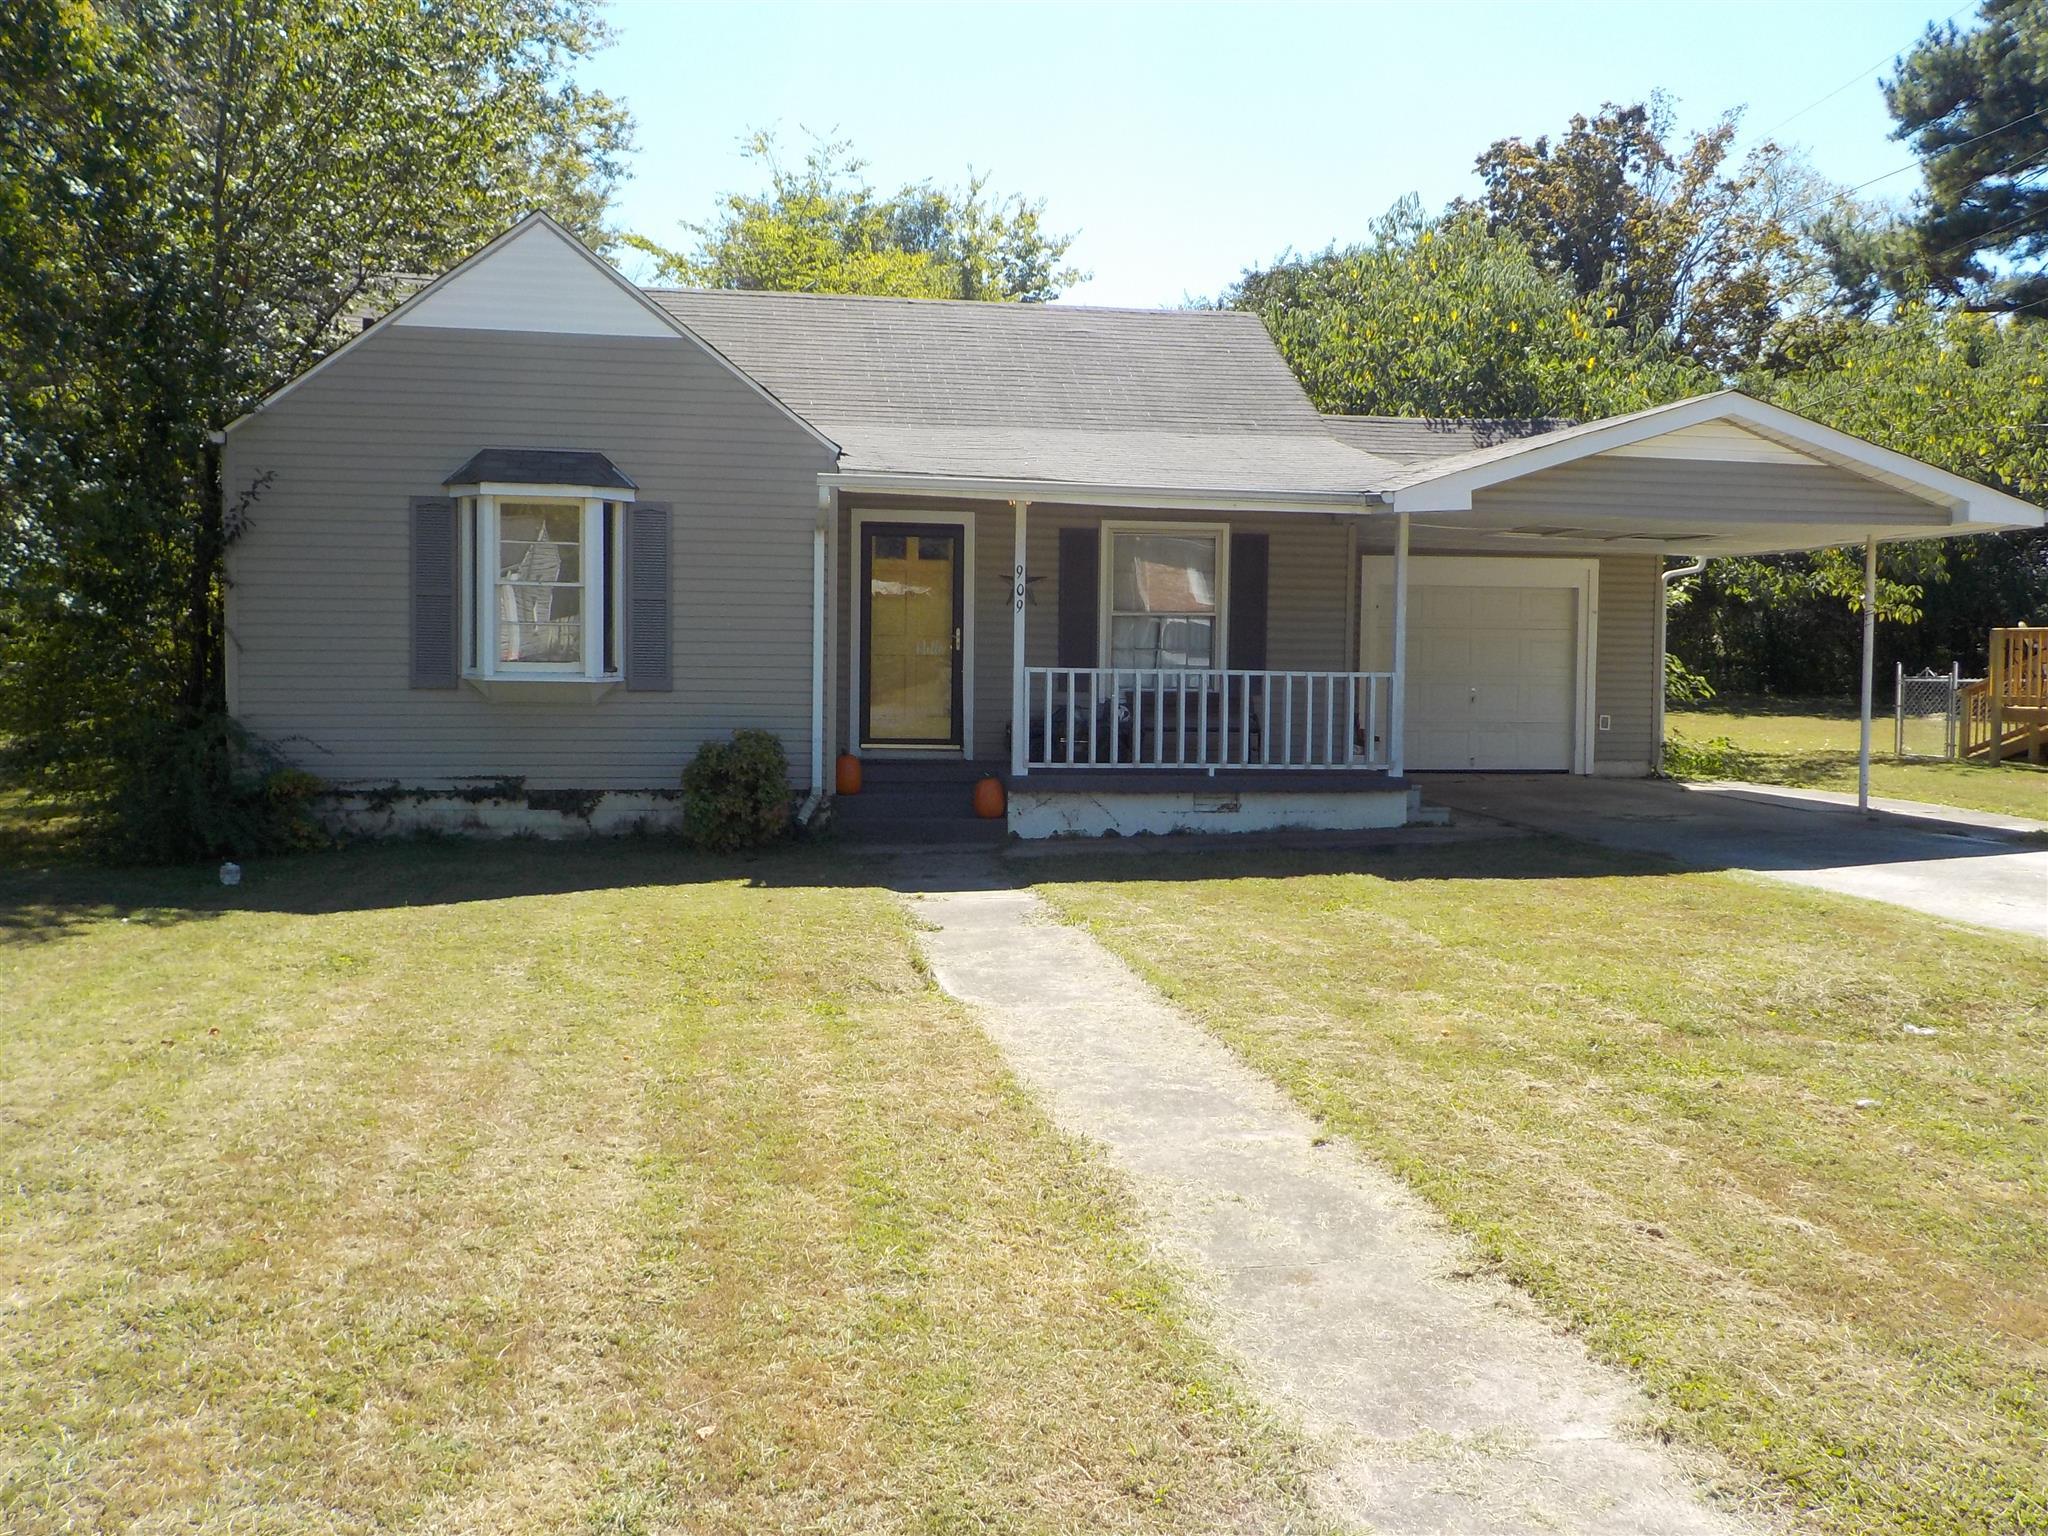 909 McKellar Dr, Tullahoma, TN 37388 - Tullahoma, TN real estate listing